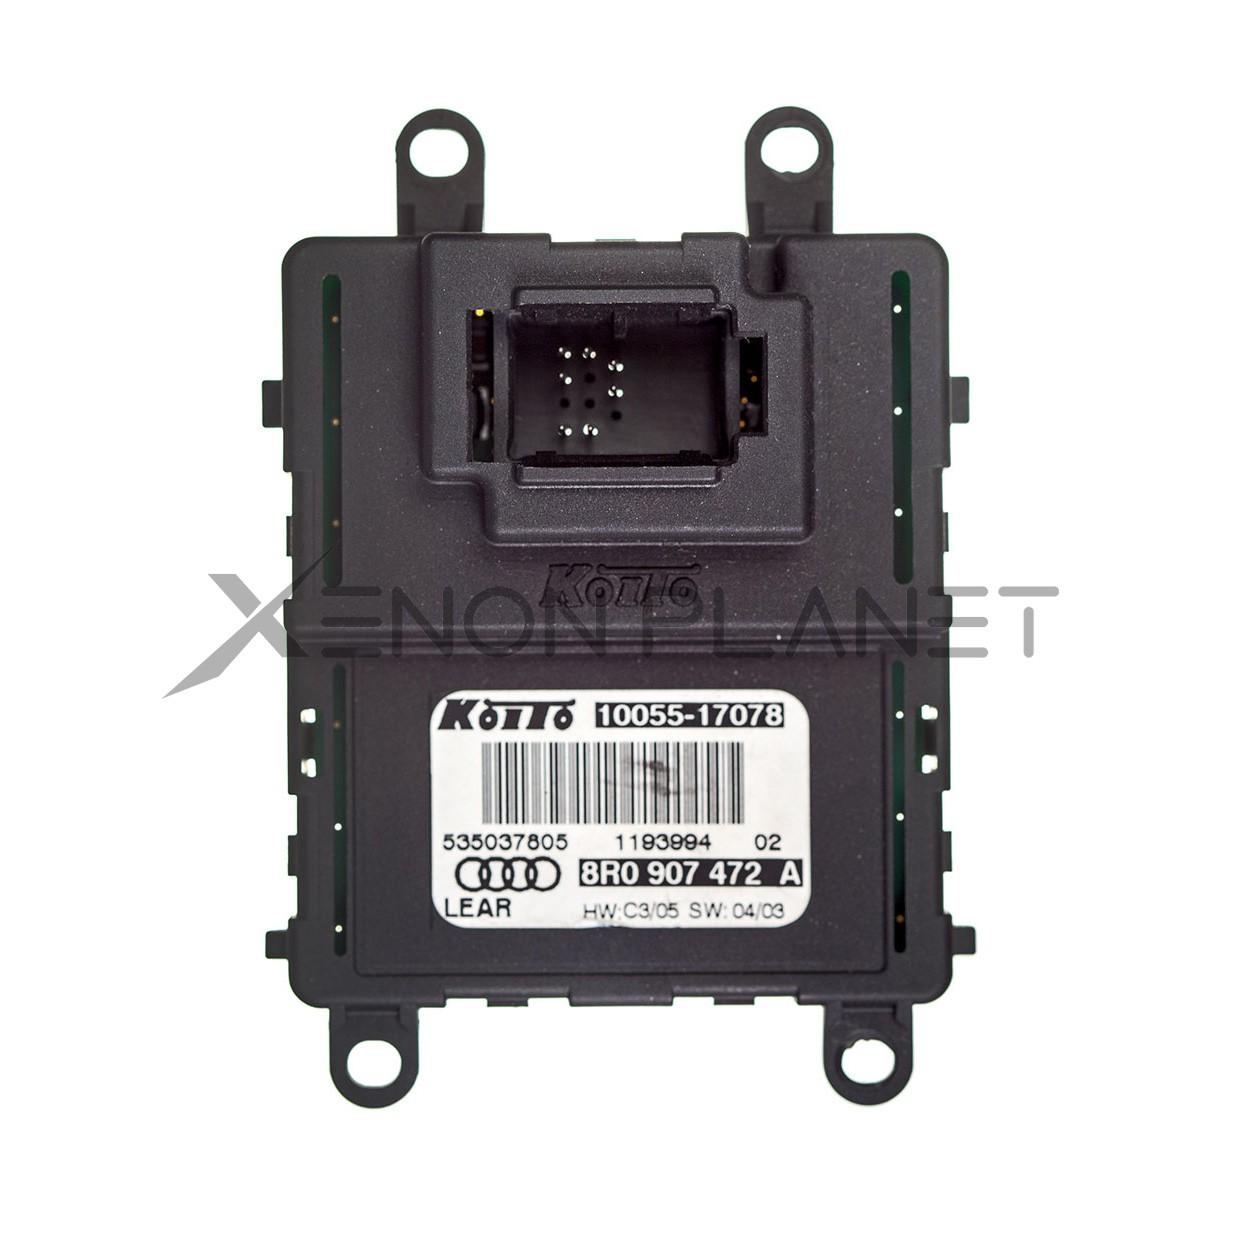 Image result for Koito 8R0 907 472 A 8R0907472A LED Control Unit Module